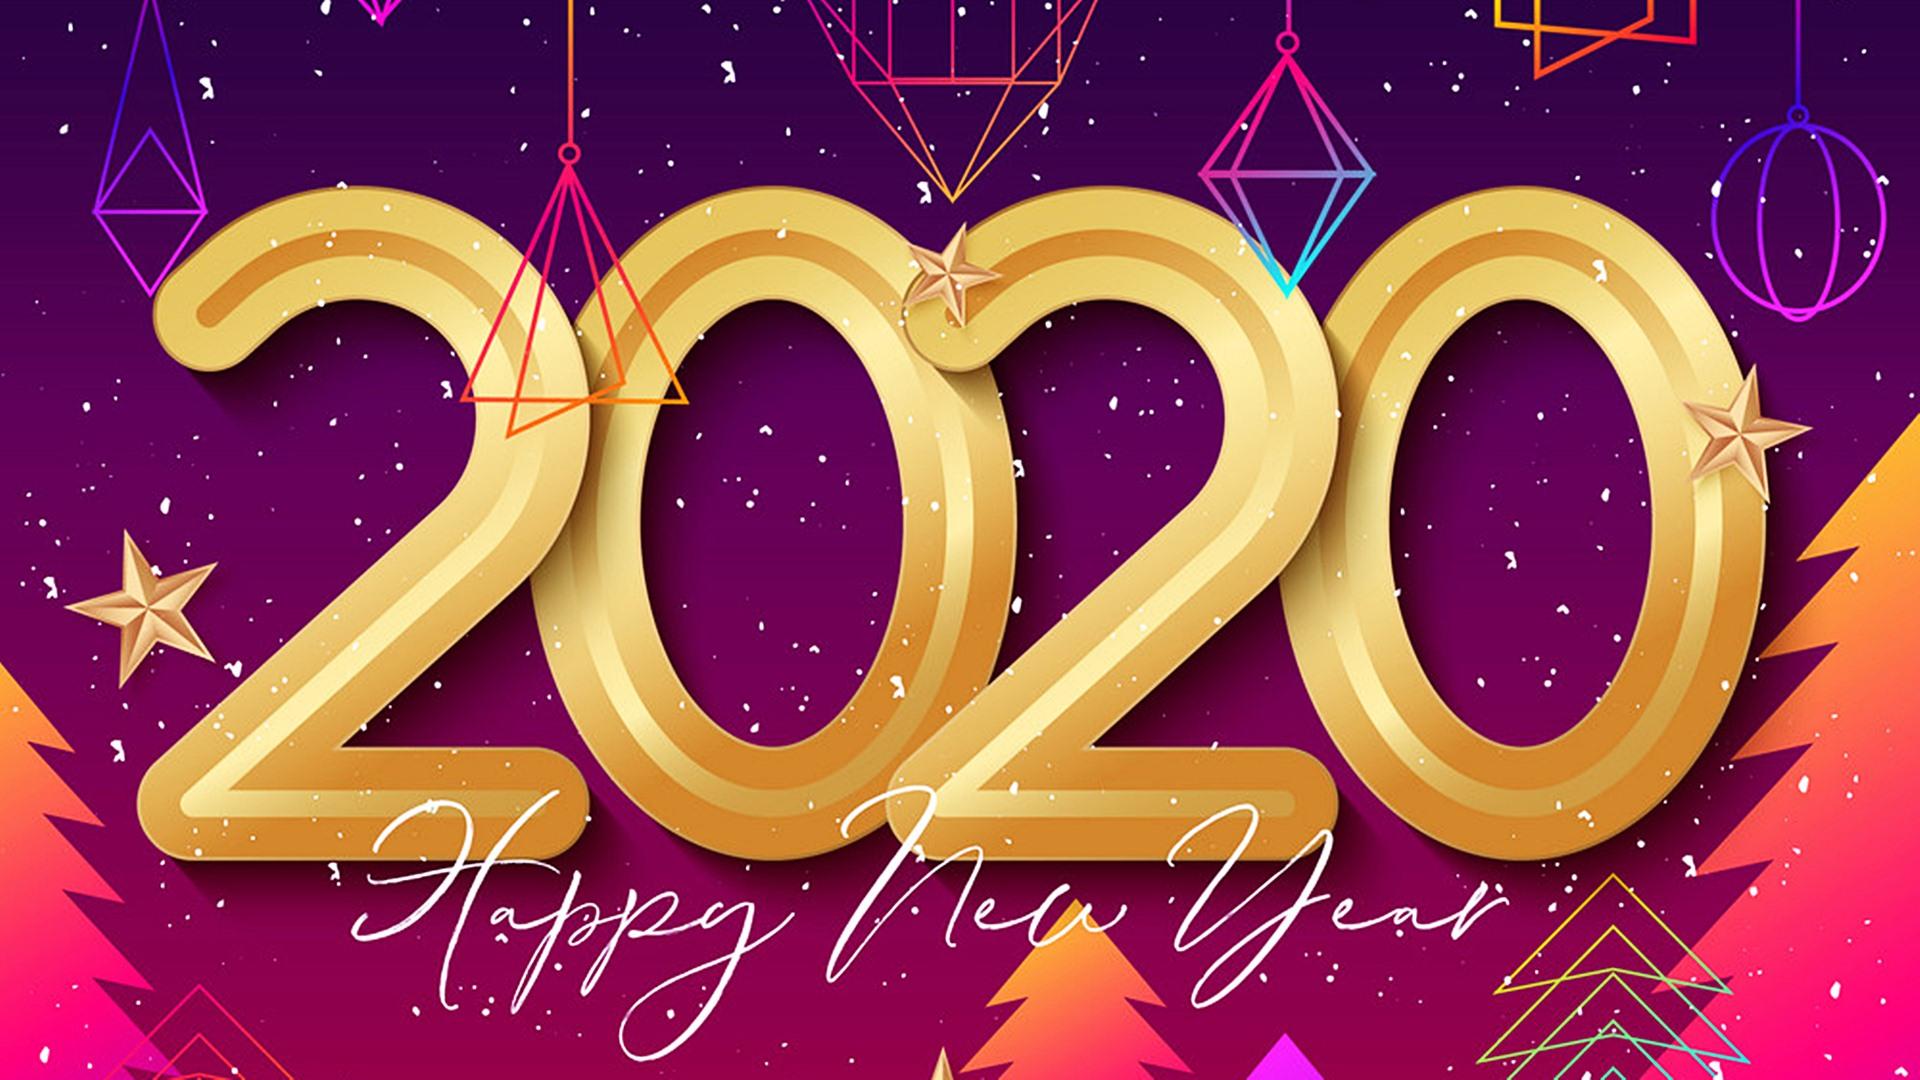 Happy New Year 2020 Best HD Wallpaper 45543   Baltana 1920x1080